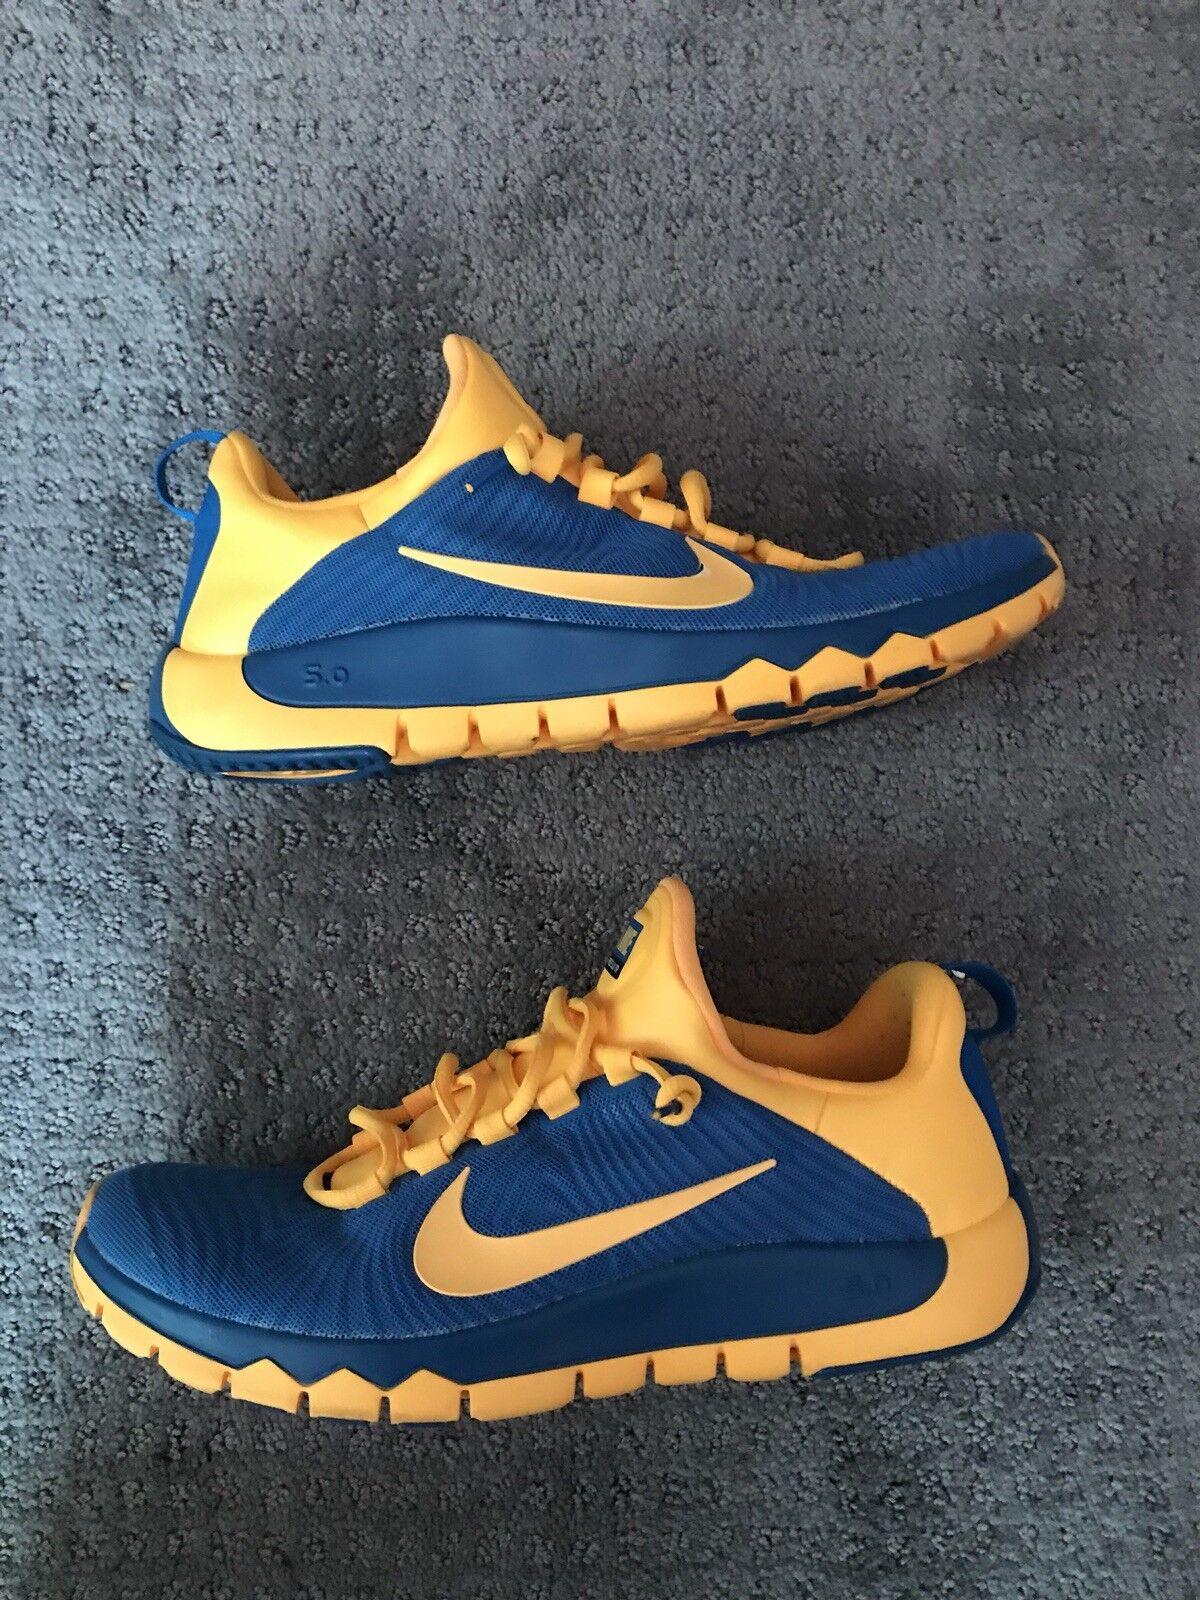 Nike Free Run 4.0 Blue Orange Size 10.5